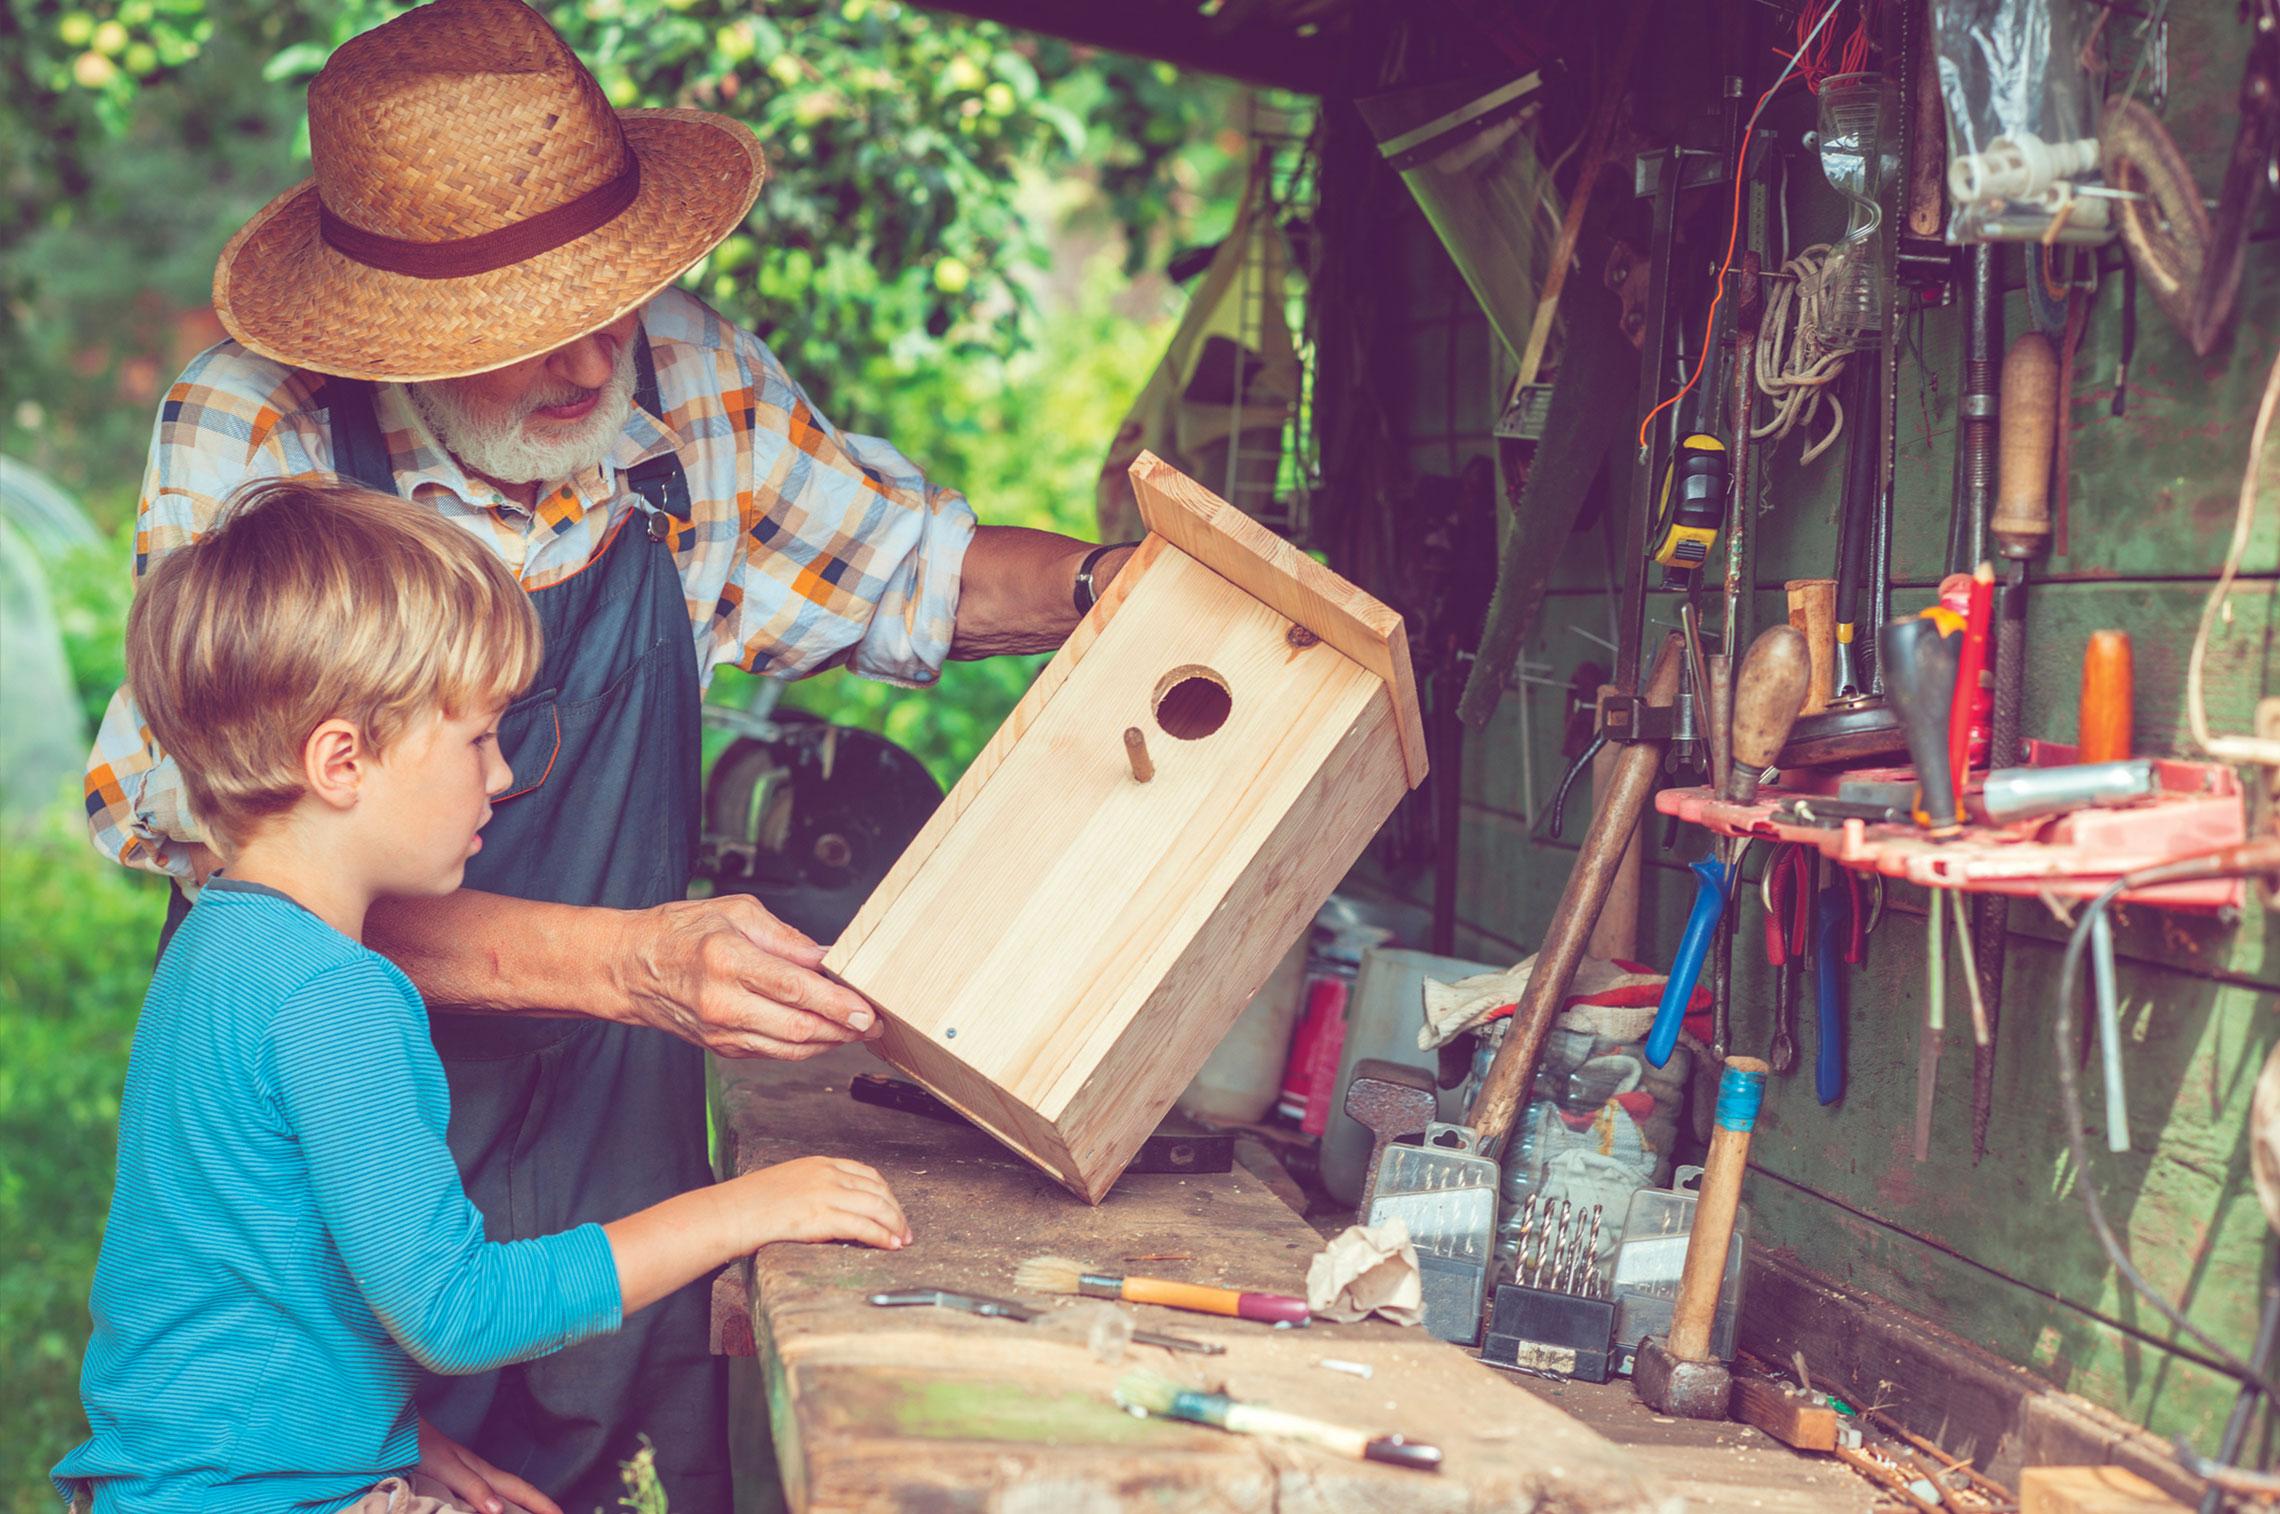 On Bird Houses & Retirement